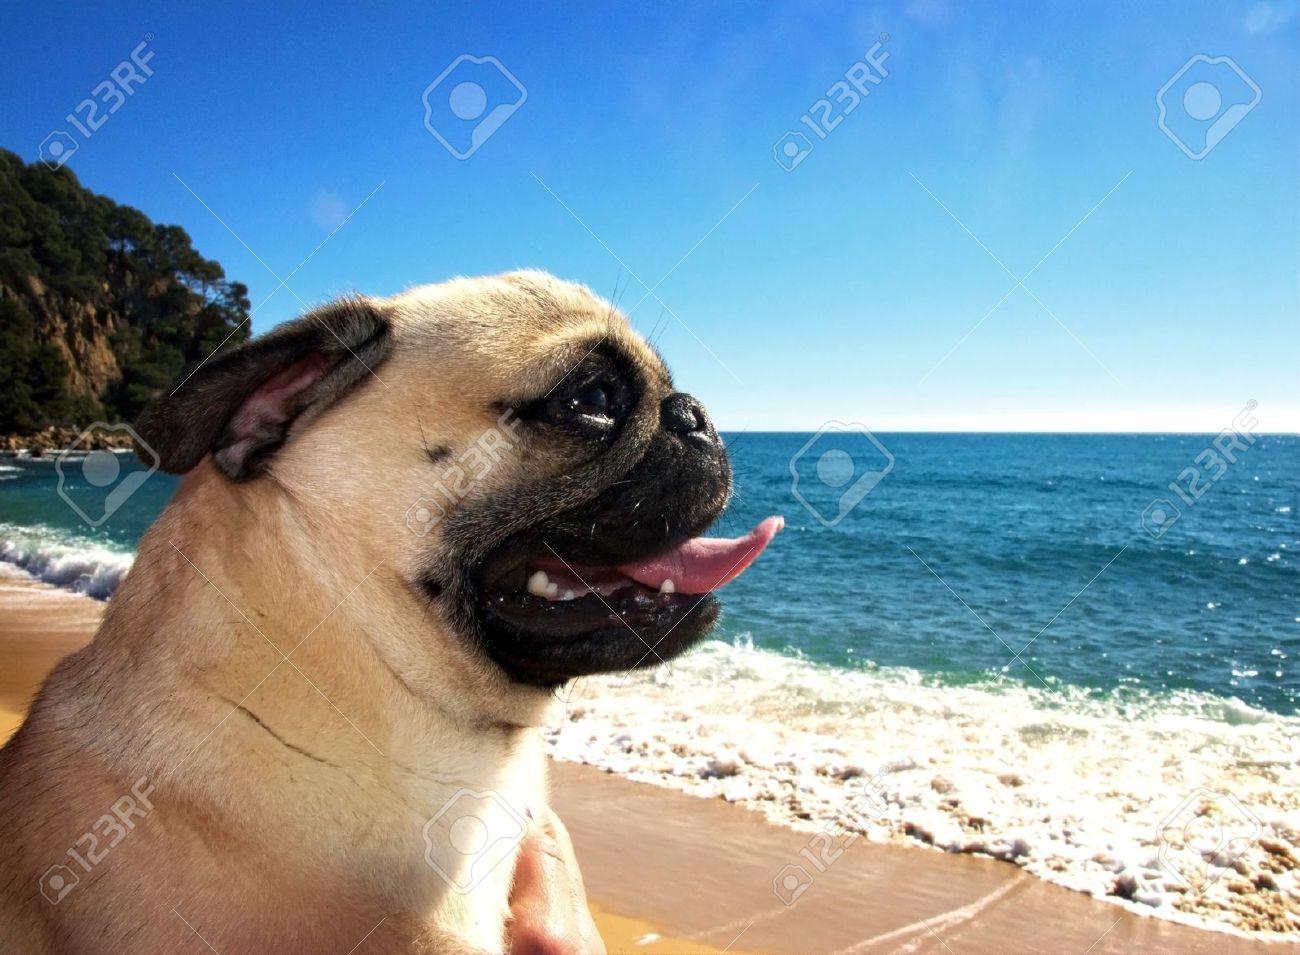 pug dog in a beach Stock Photo - 18410645